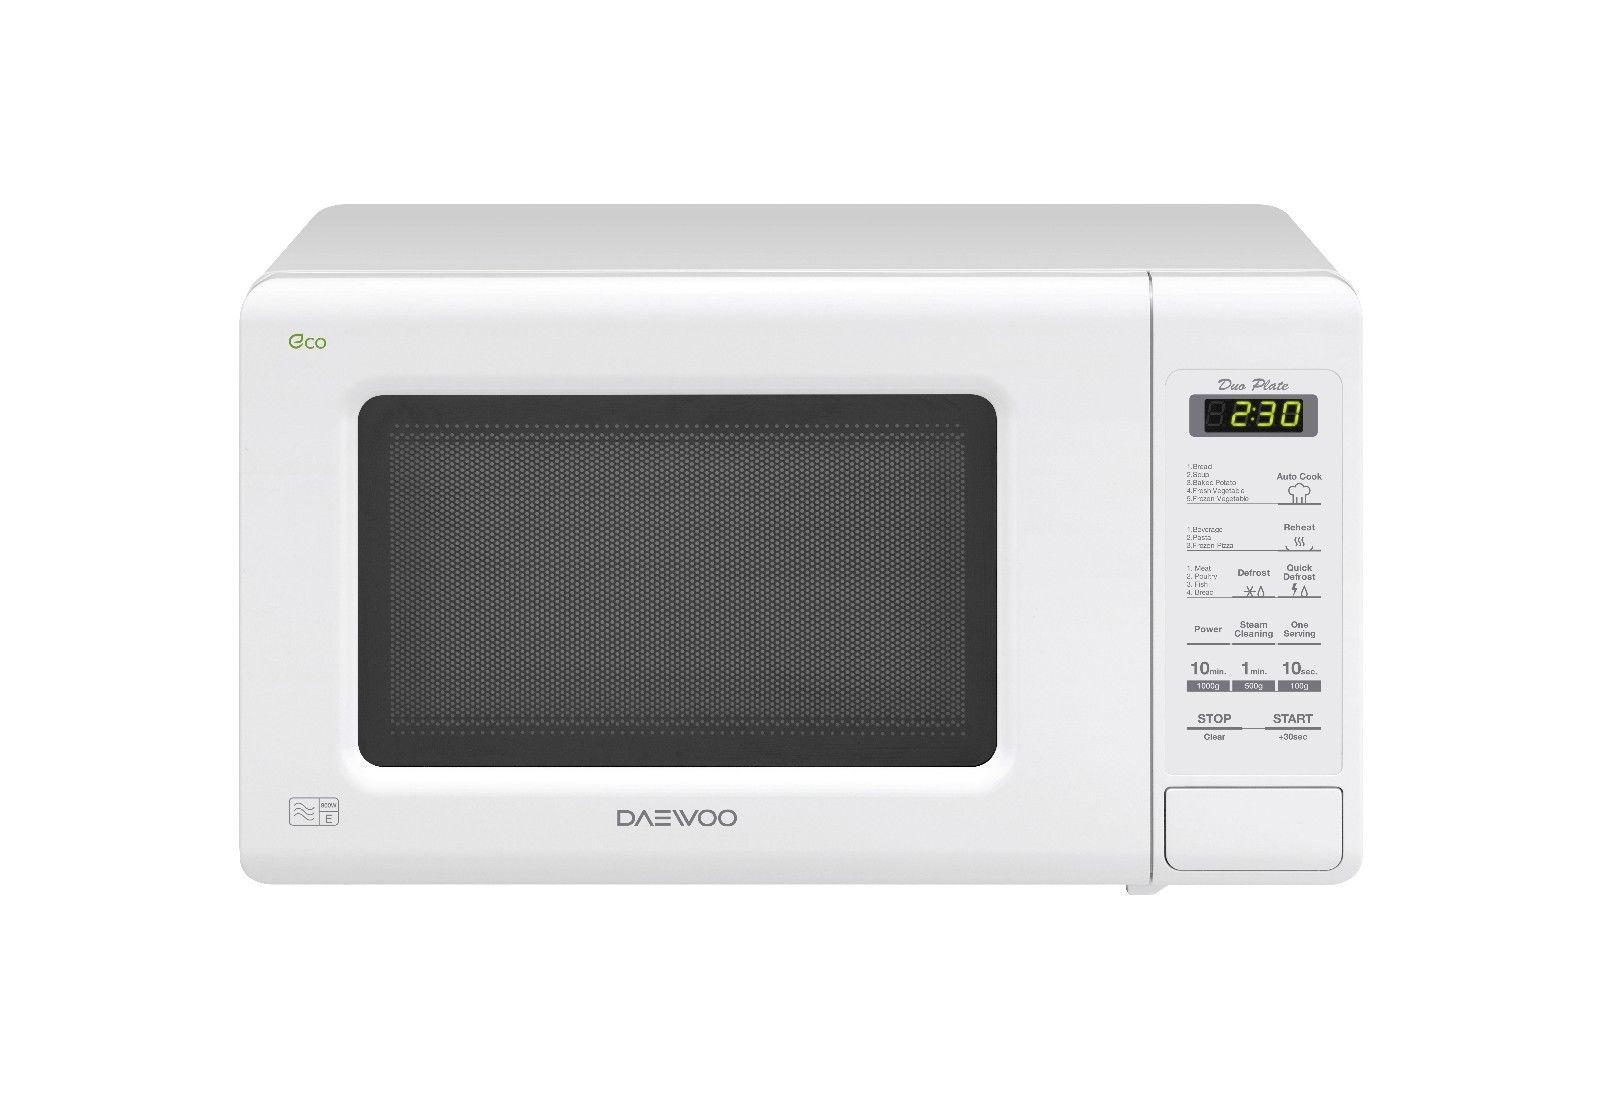 Daewoo Kor6m1r 800 Watt Microwave Oven In White